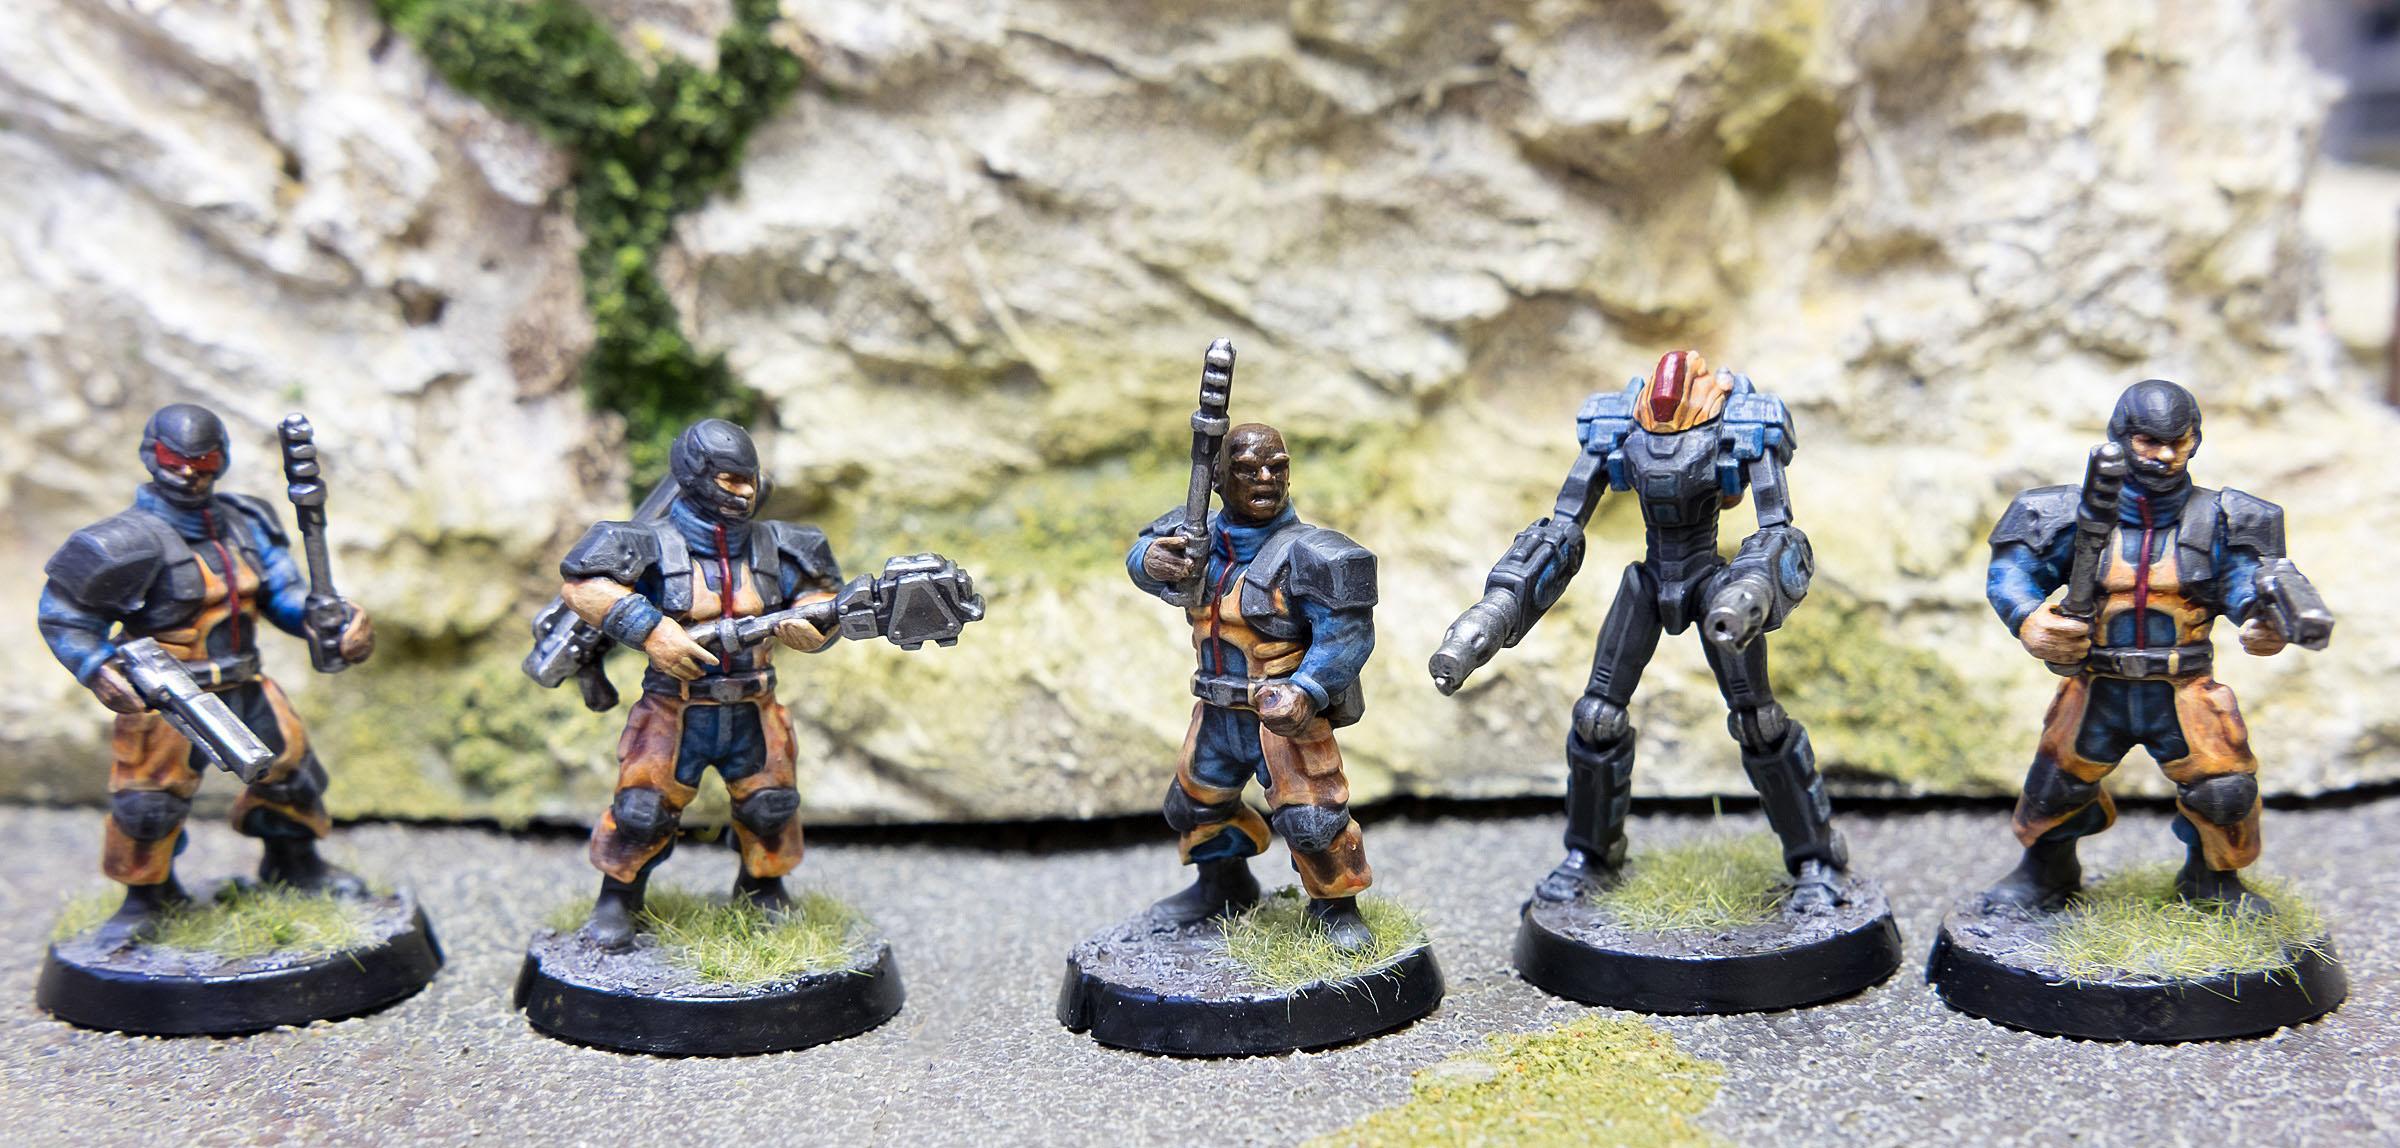 Epirian, Maelstrom's Edge, Shock Baton, Subjugator, Suppression Team